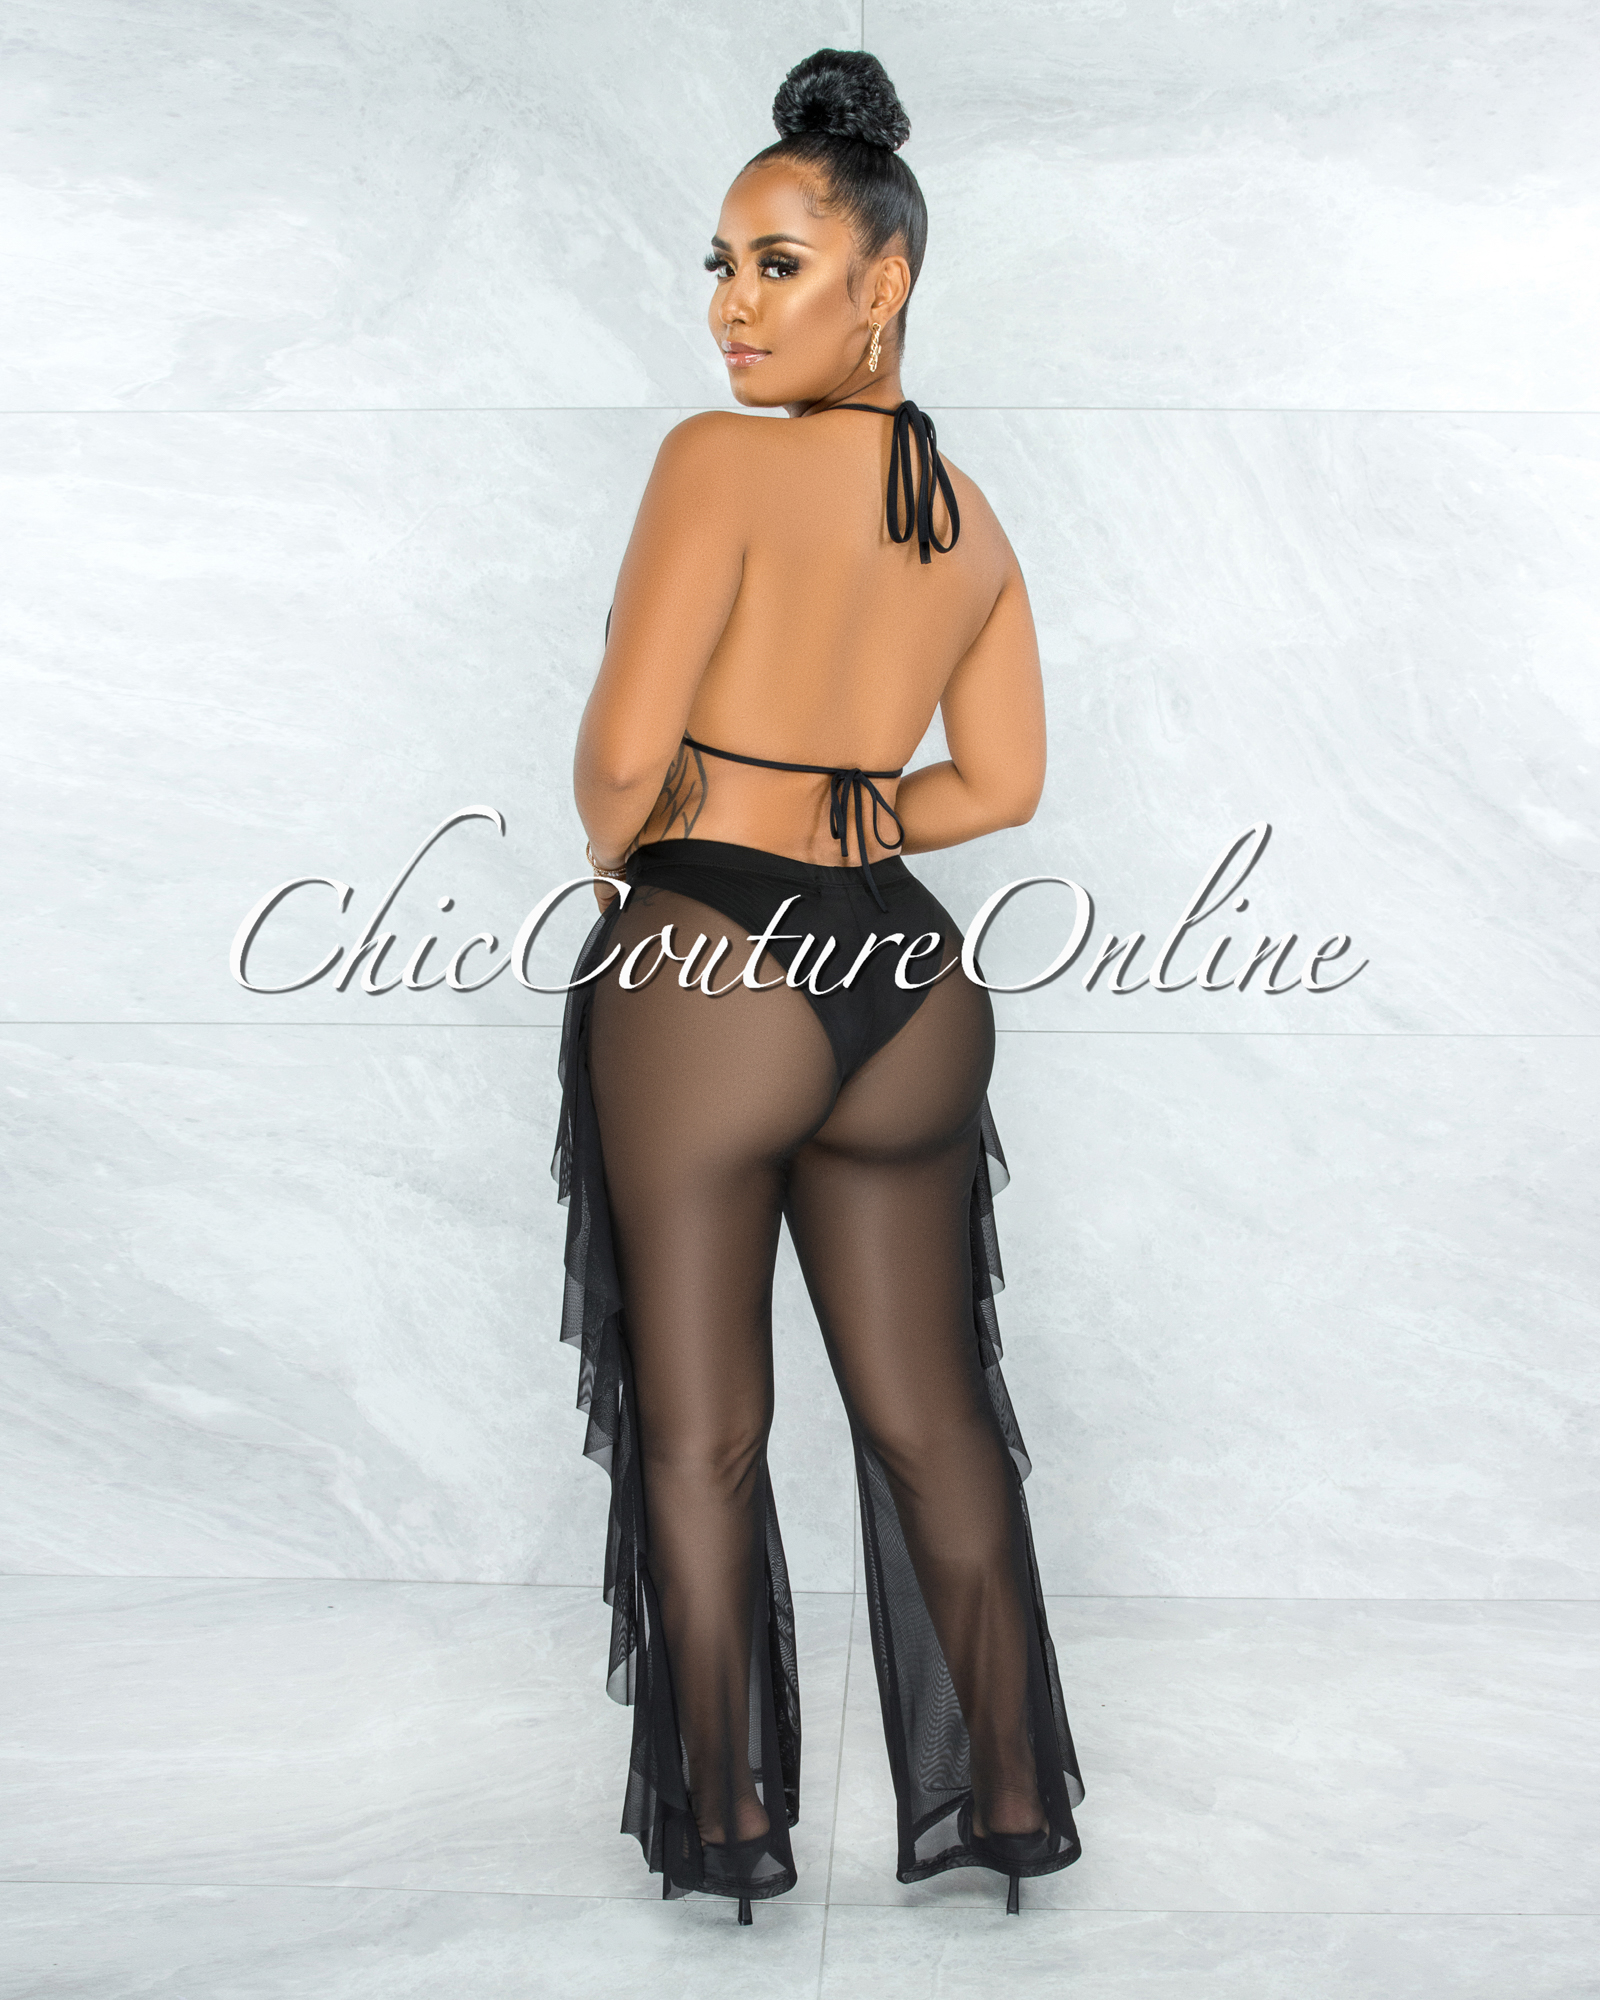 Yardley Black Mesh Cover-Up Ruffle Pants Set